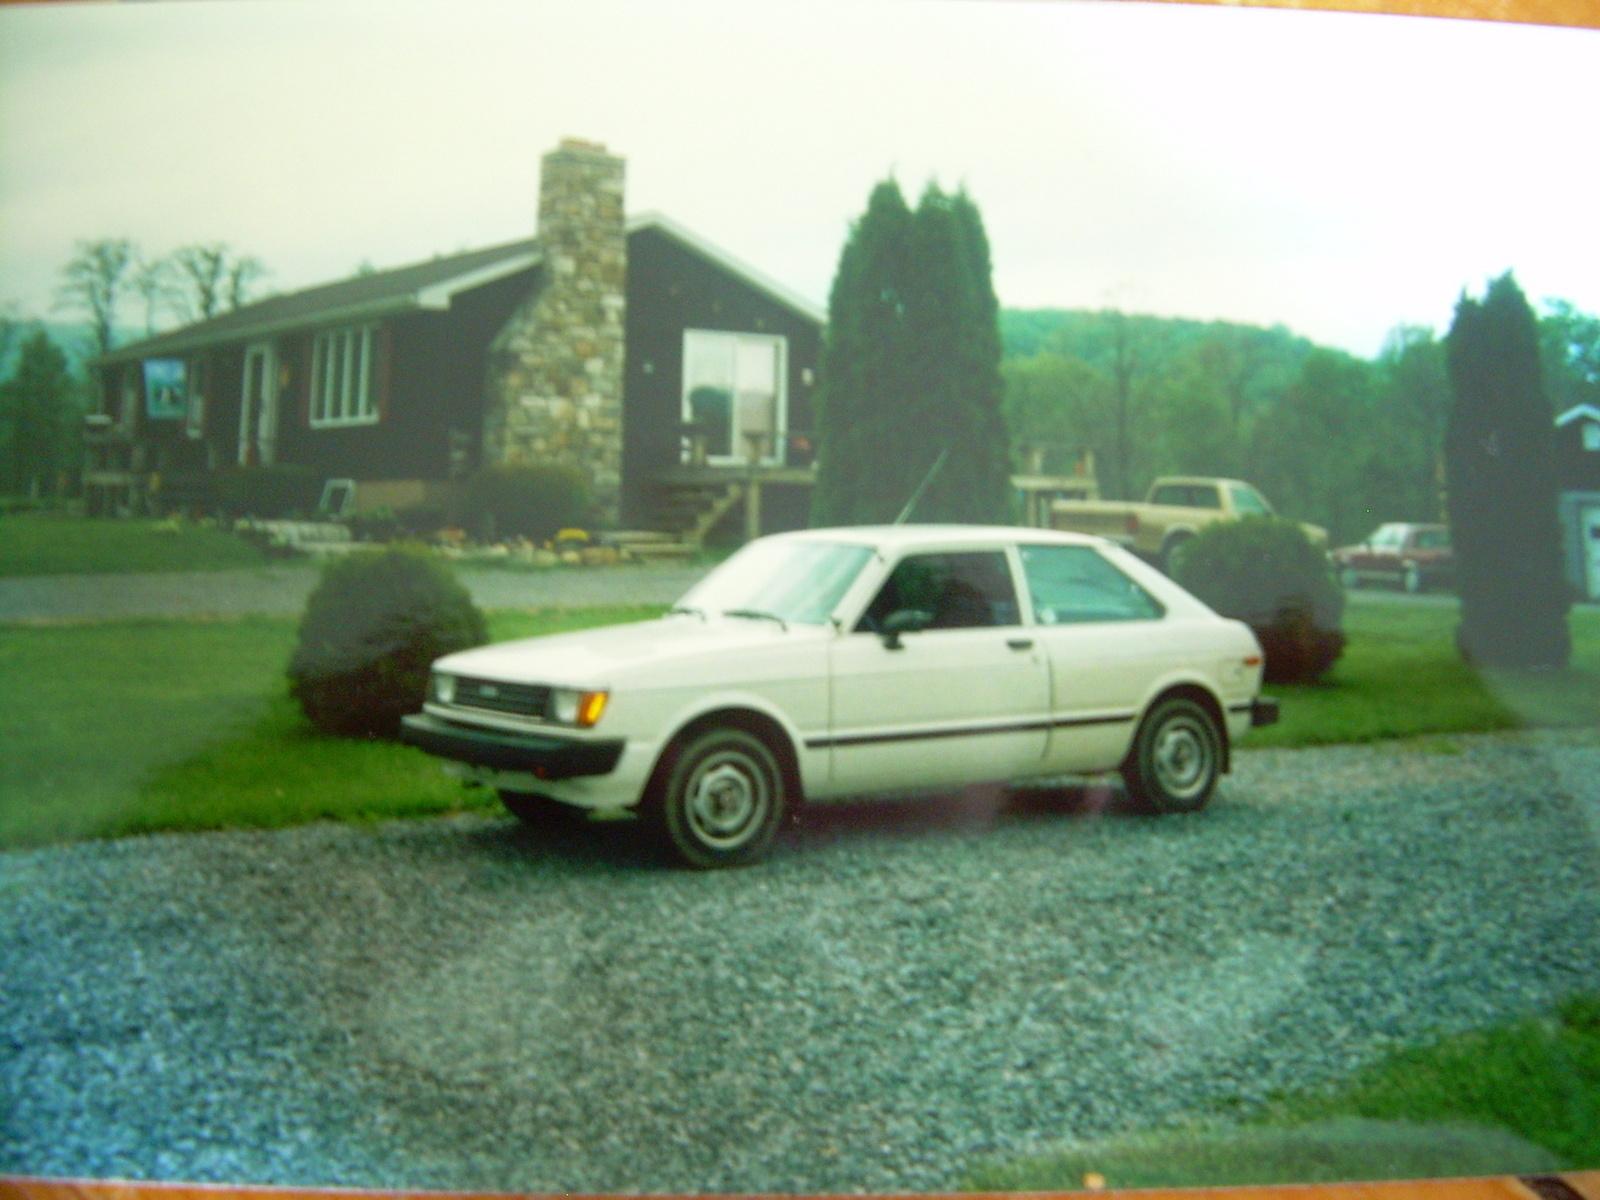 1981 toyota corolla overview cargurus rh cargurus com 1980 Toyota Corolla 1981 Toyota Corolla Hatchback